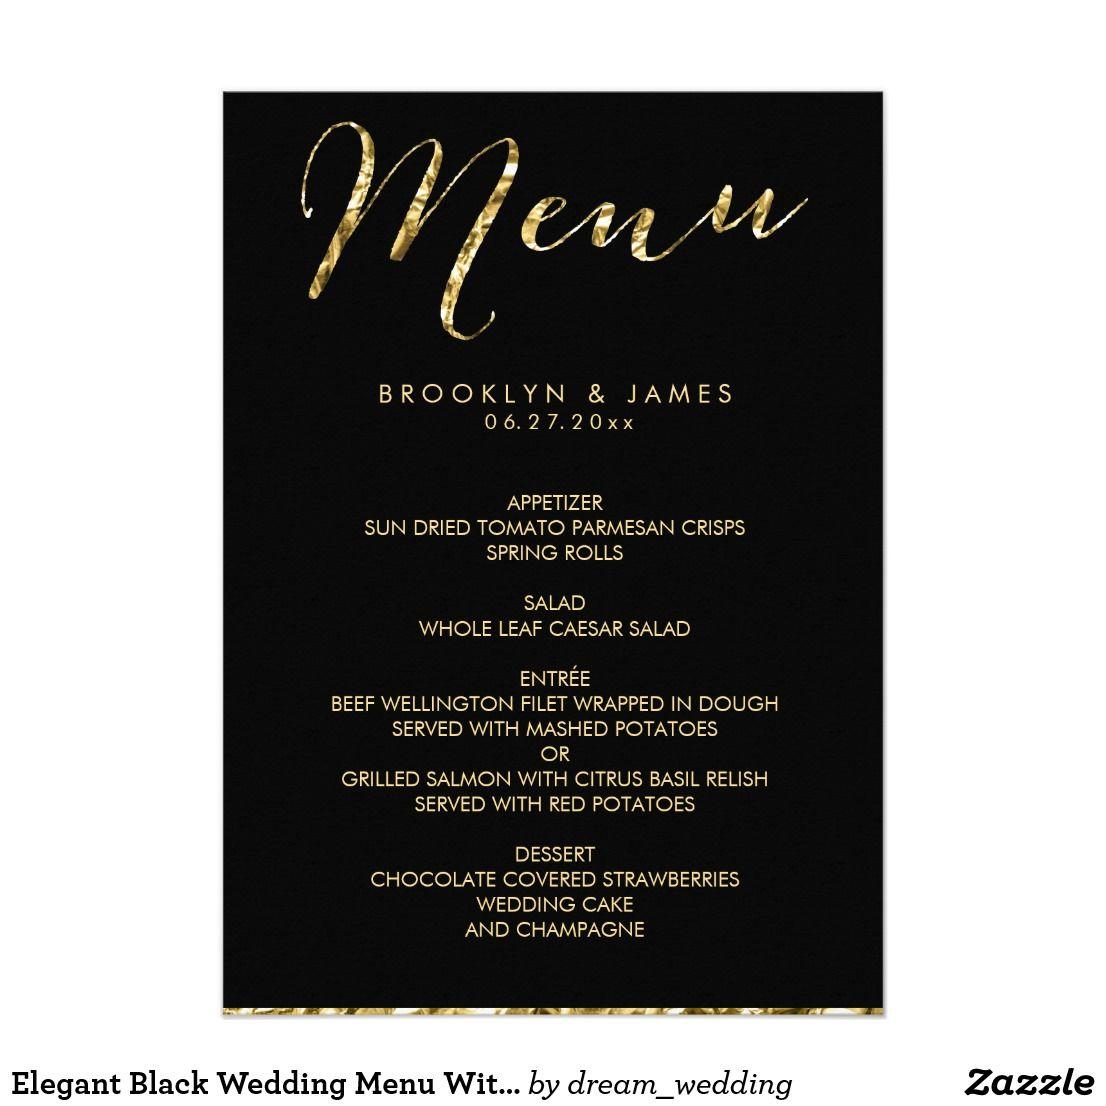 Elegant Black Wedding Menu With Gold Foil Card | Zazzle and ...